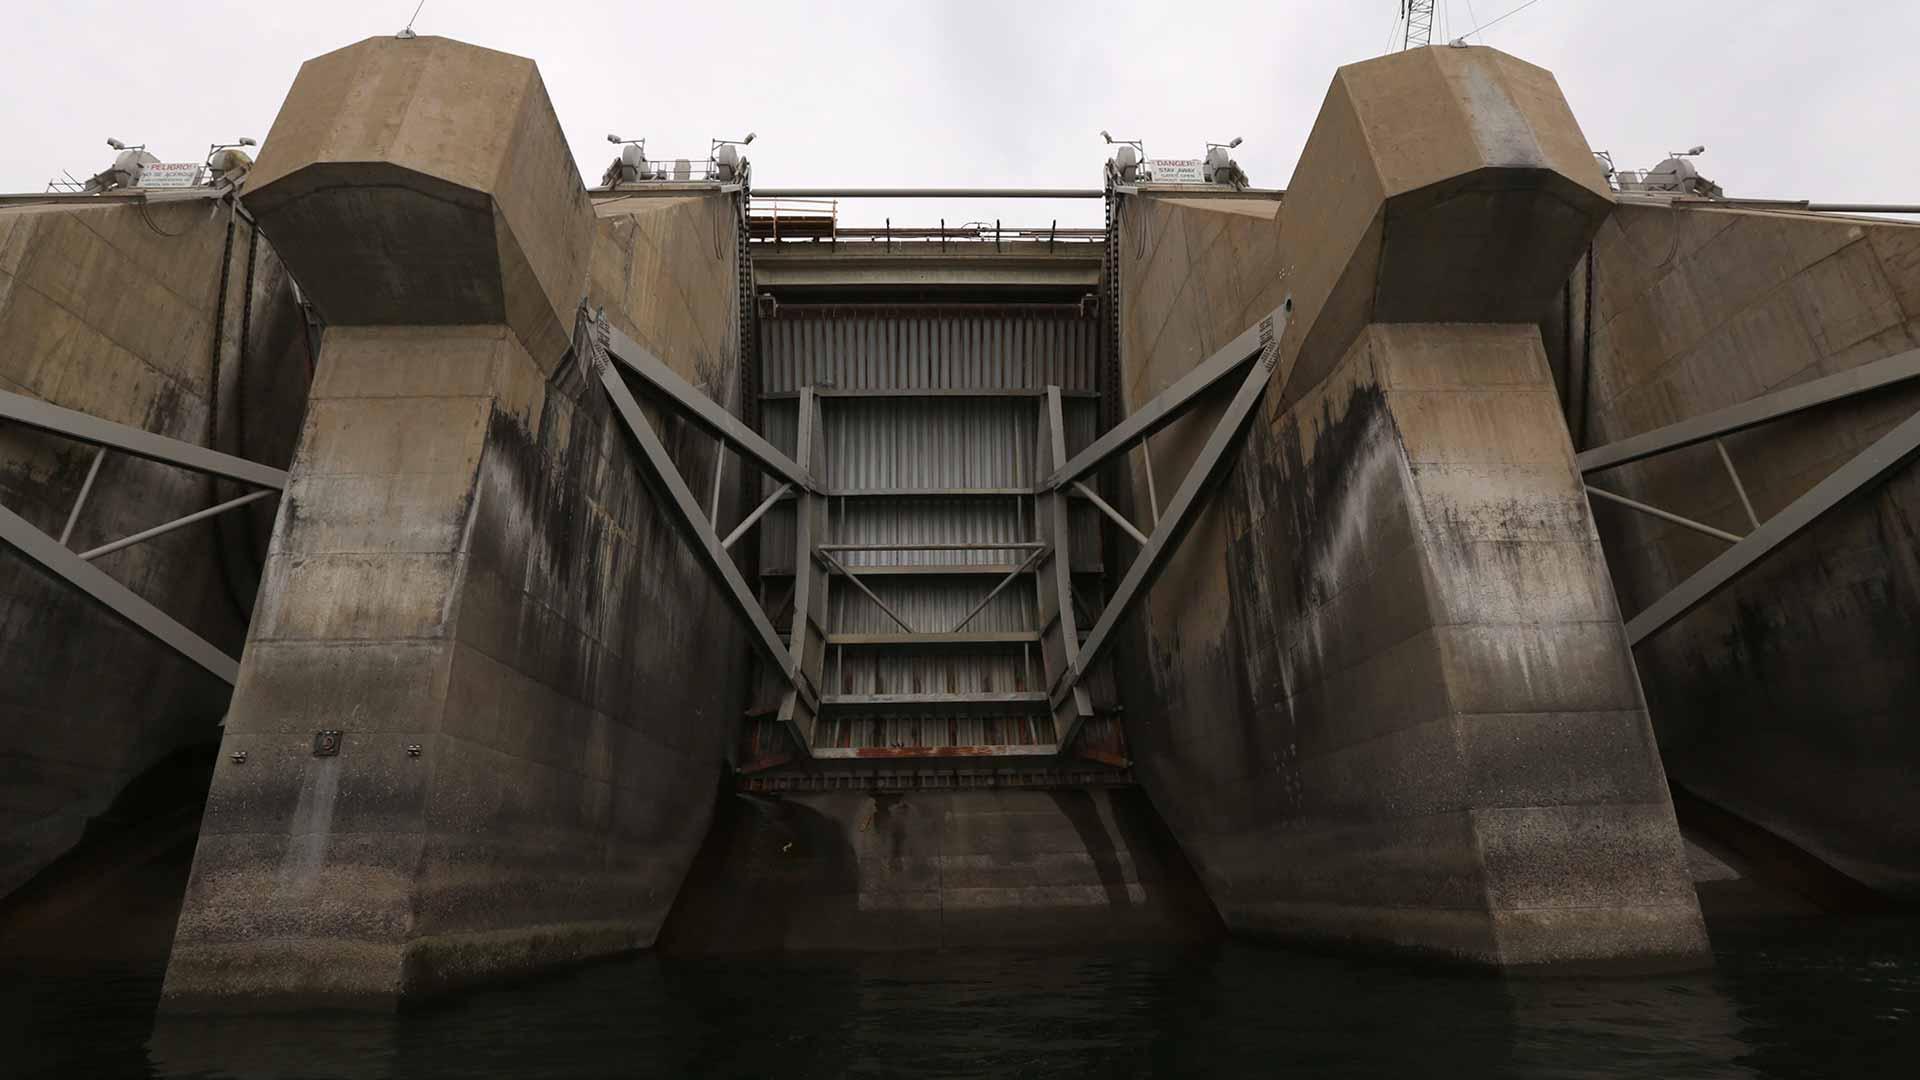 Radial gates at Wanapum Dam